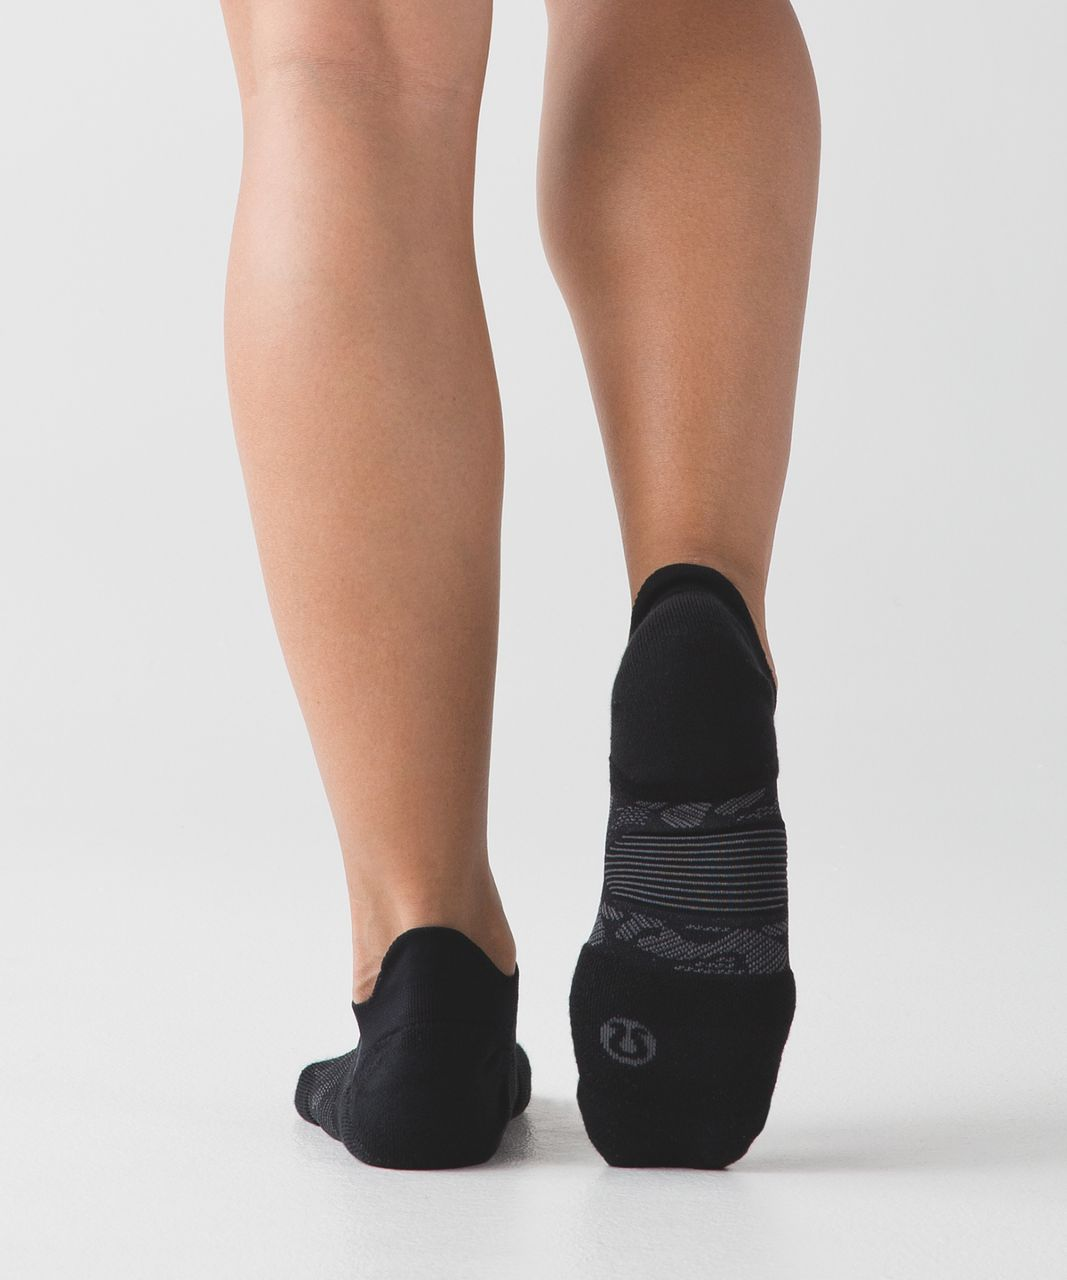 Lululemon High Speed Sock (Silver) - Black / Dark Carbon